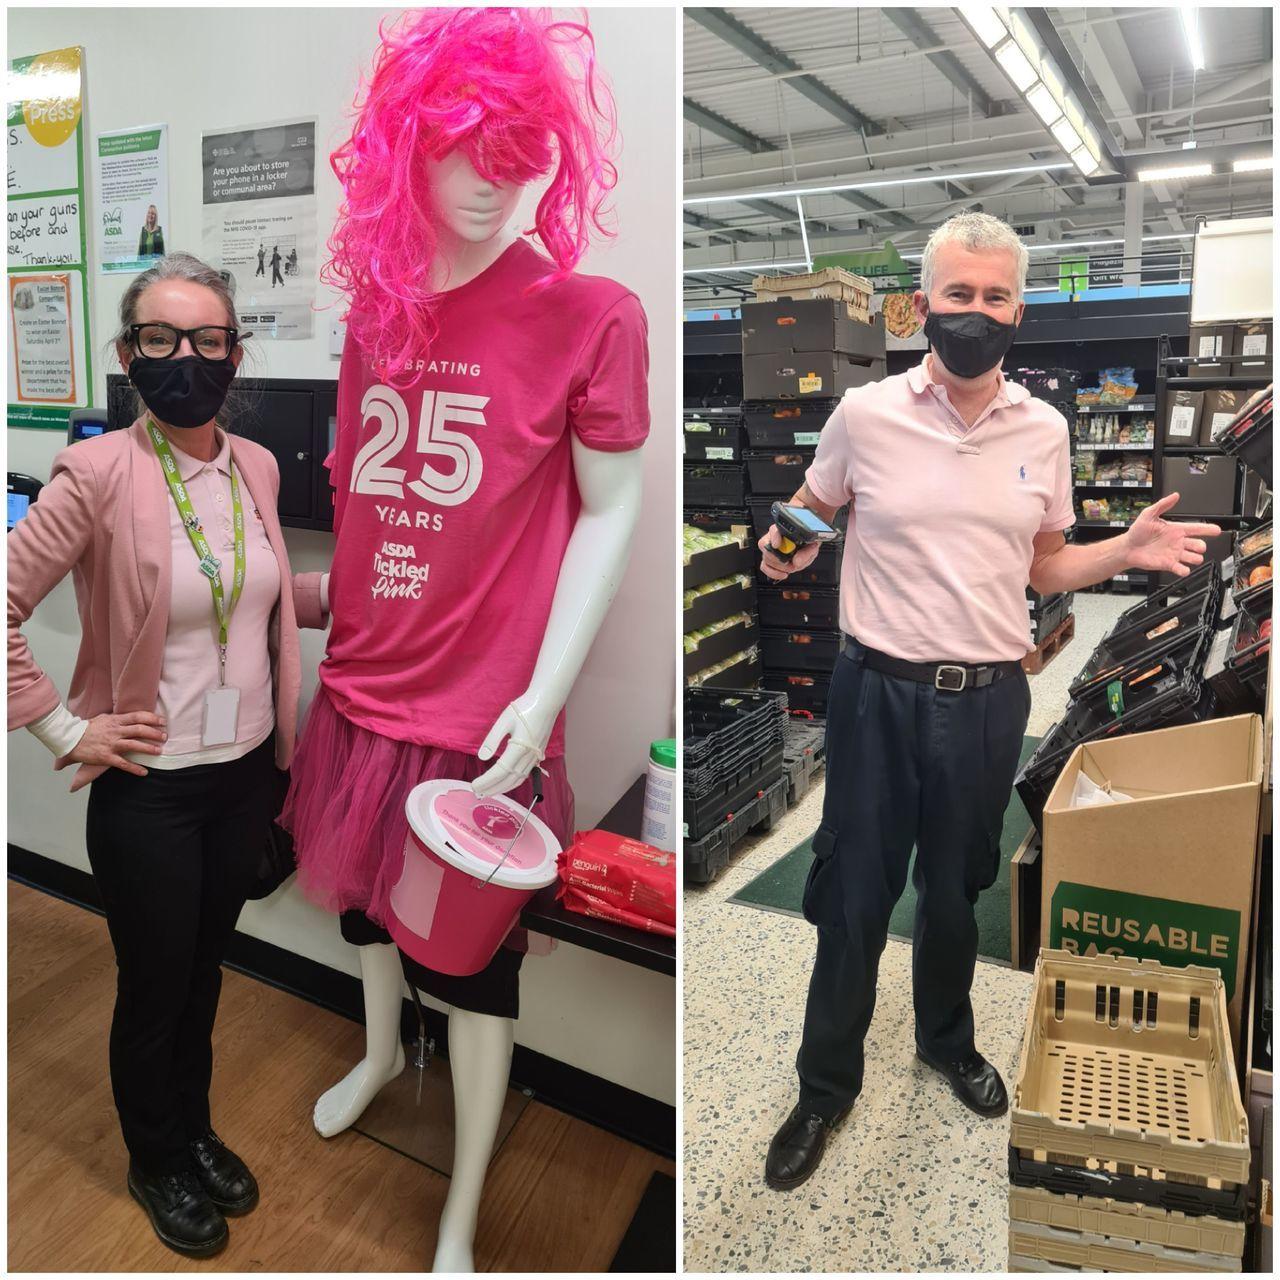 Ticked Pink | Asda Newport Isle of Wight